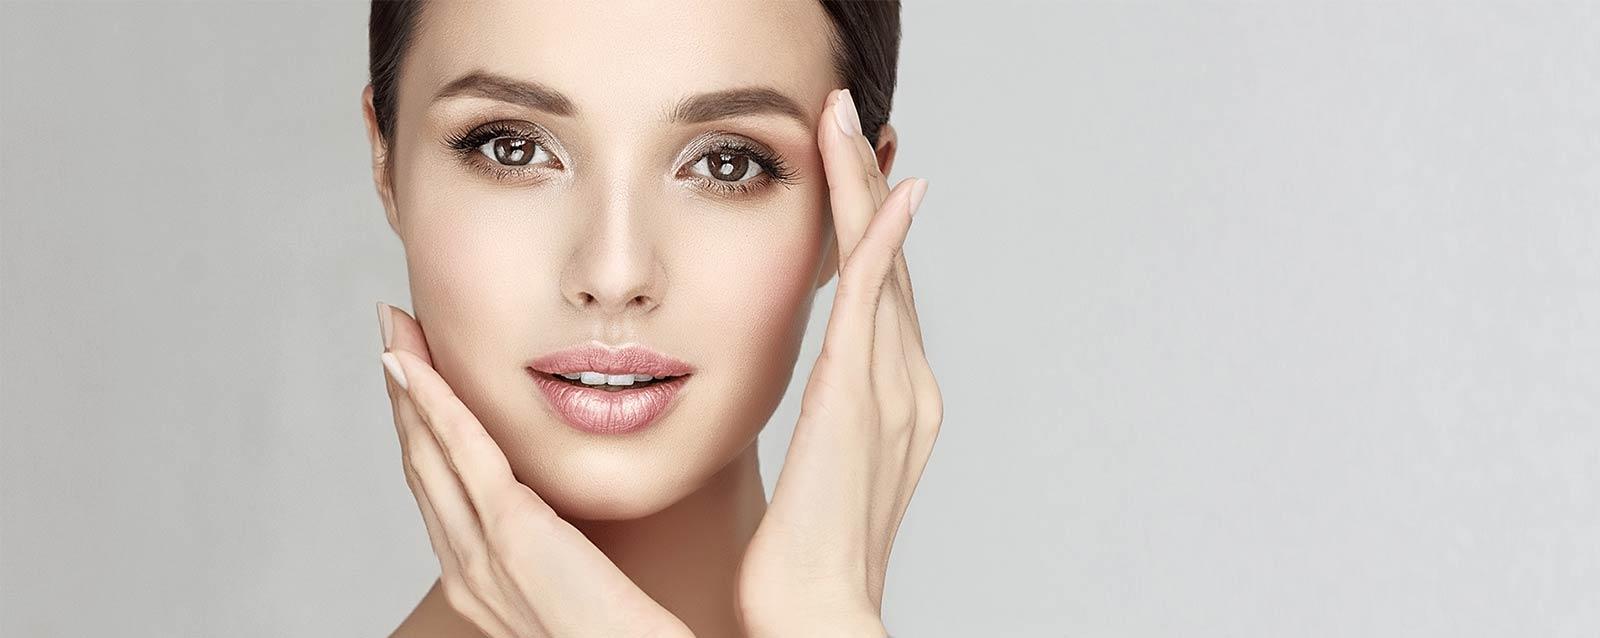 Protocolo: Limpeza de Pele Associada ao Peeling de Diamante ou de Cristal Antirrugas e Hidratante